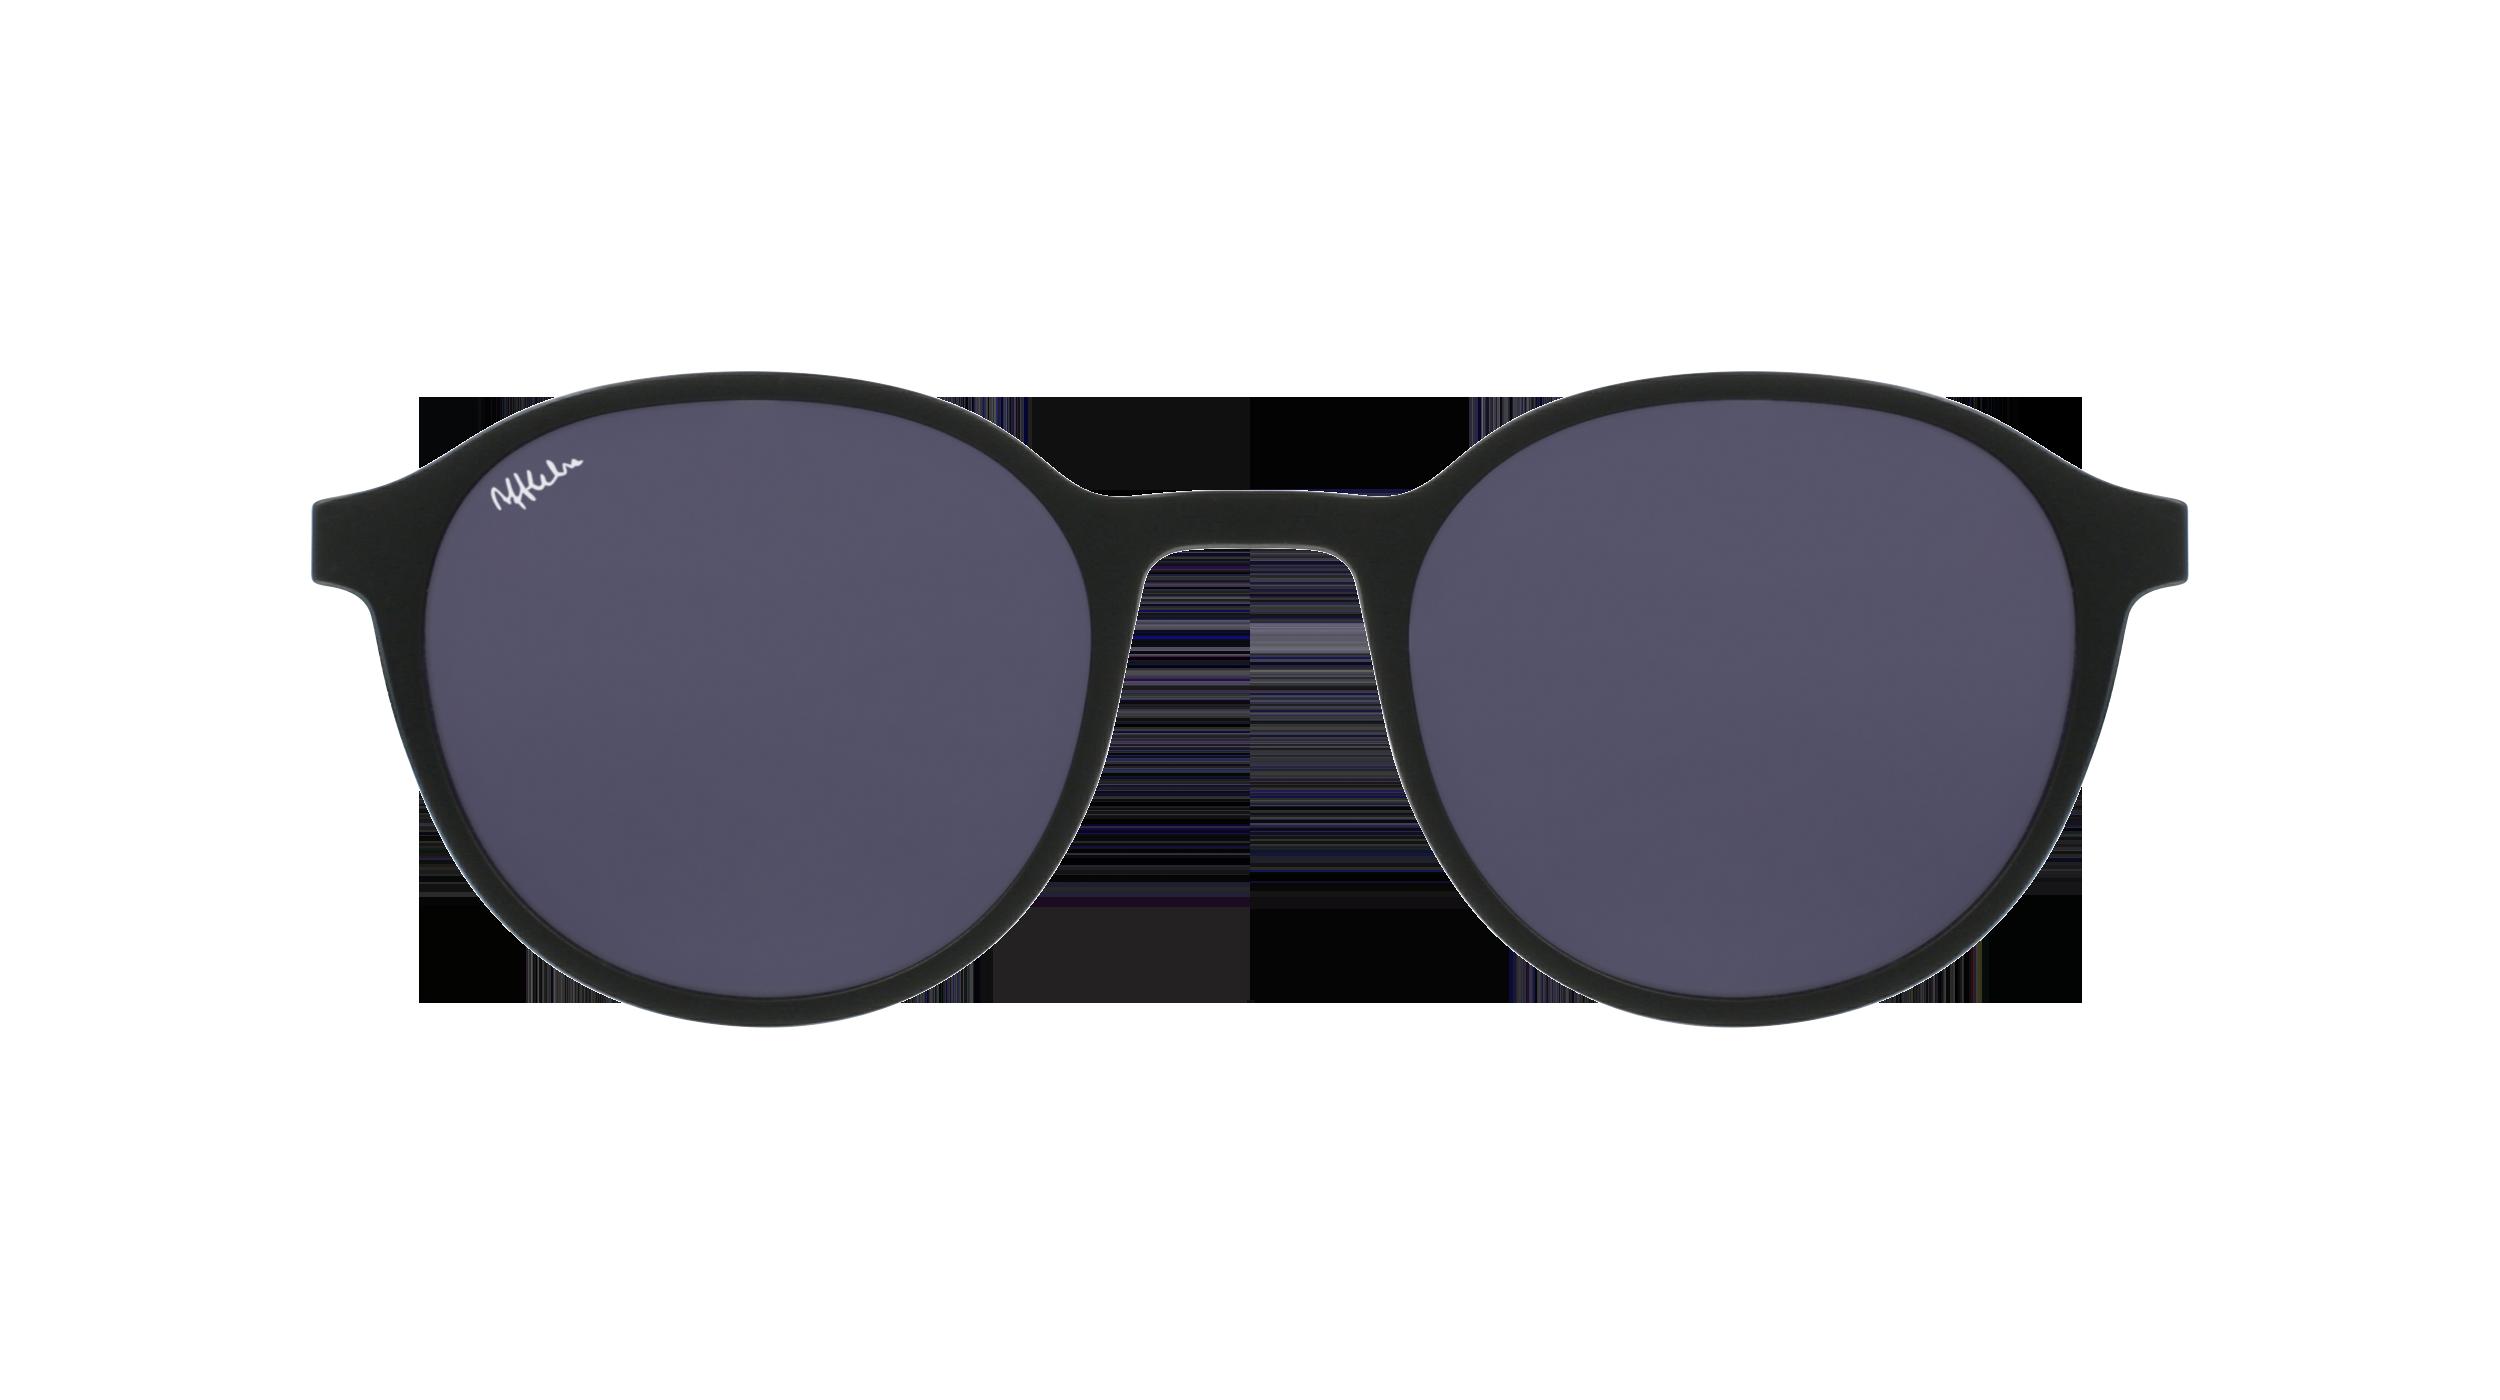 afflelou/france/products/smart_clip/clips_glasses/07630036458860.png